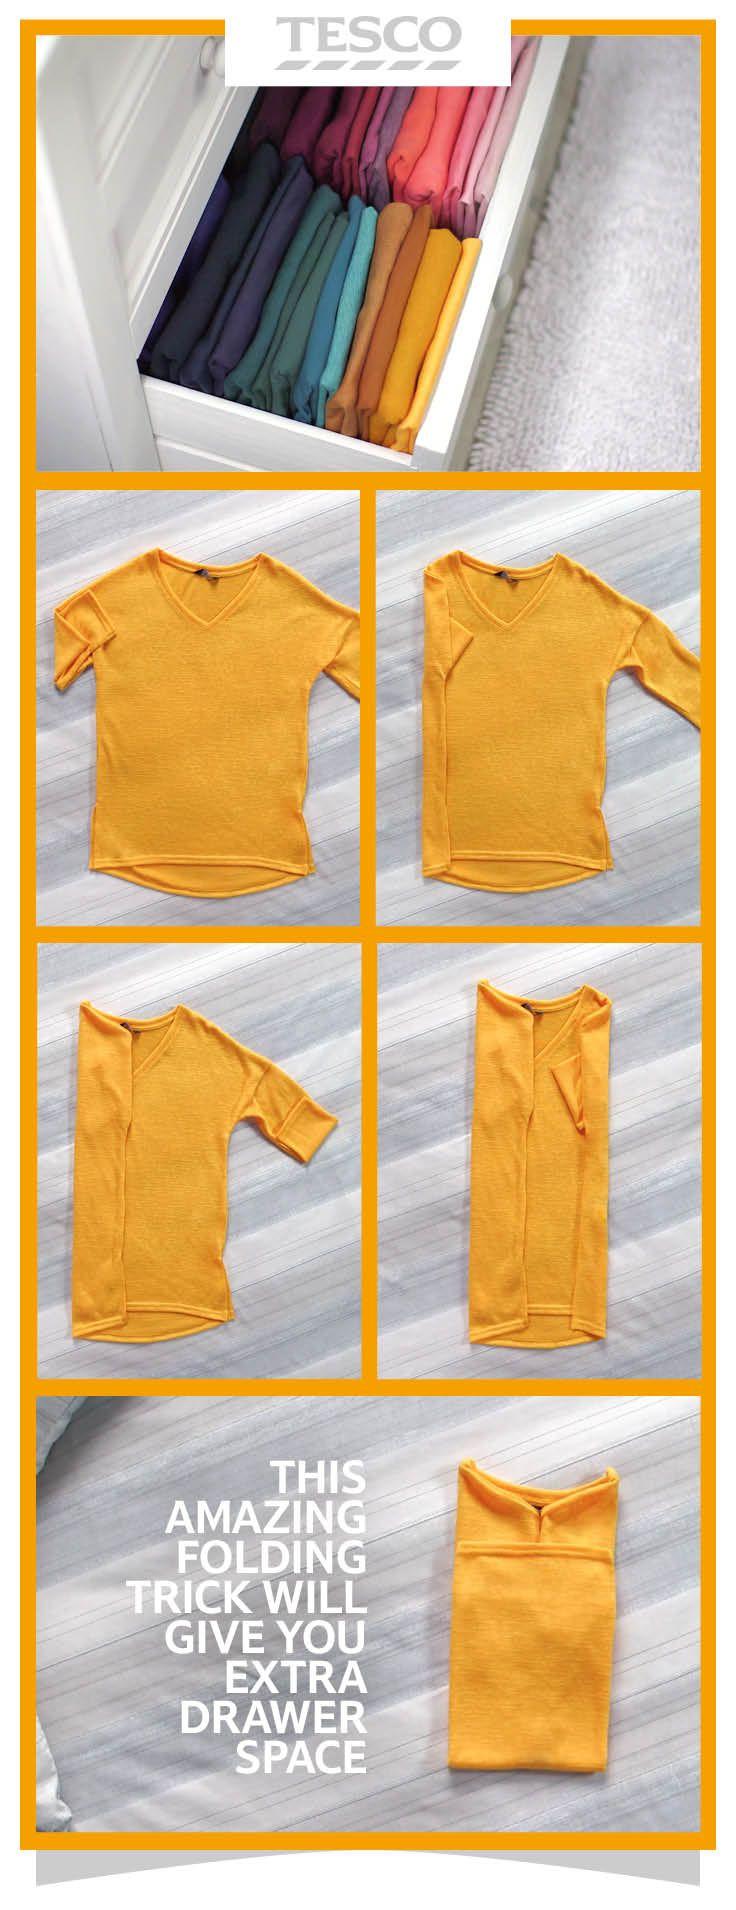 best dobrar camisetas images on pinterest fold shirts fold